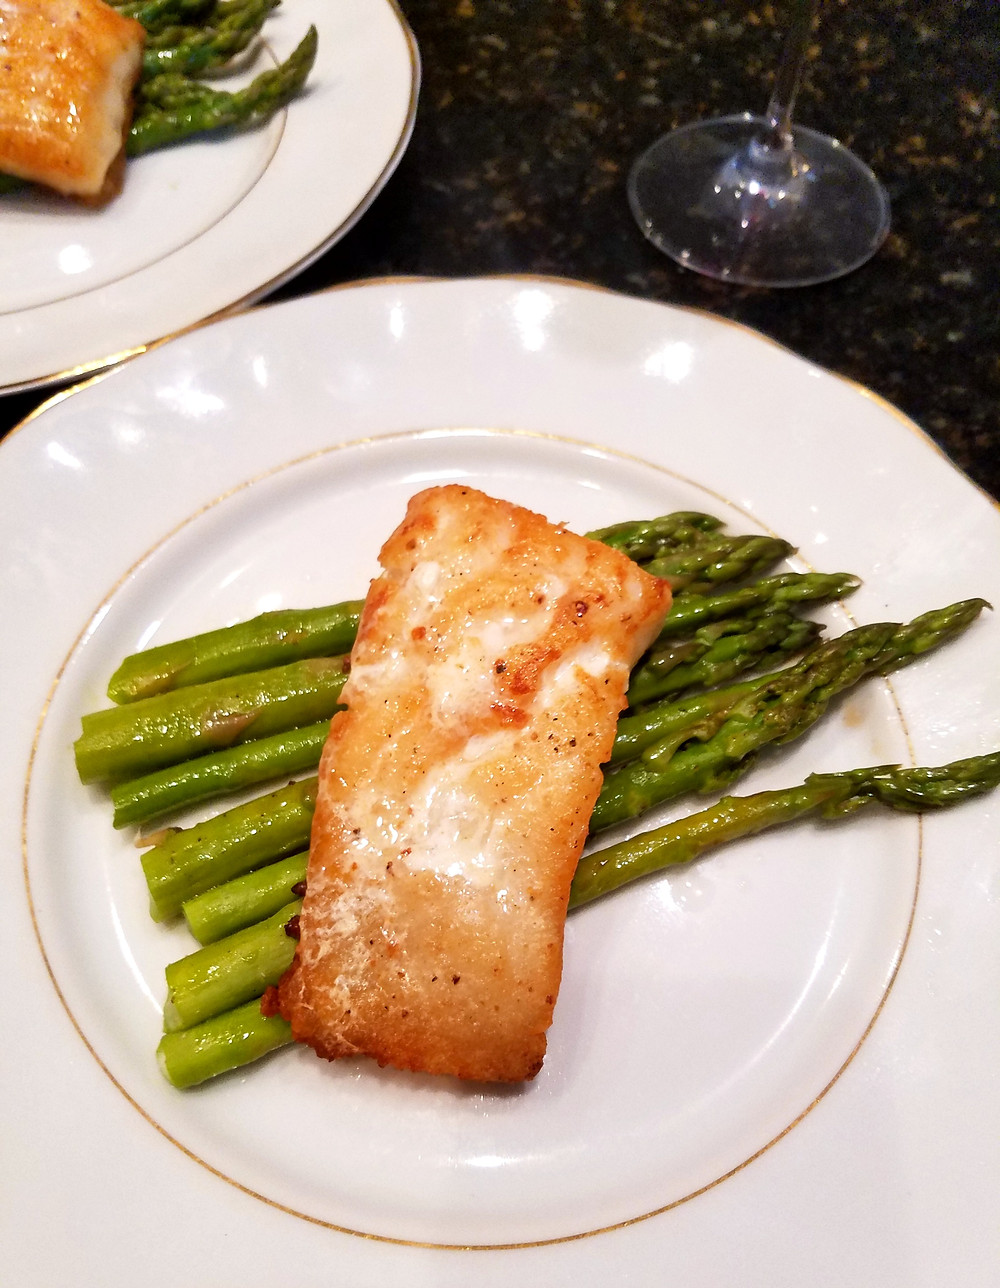 Pan-Seared Chilean Sea Bass with Asparagus (no gluten, soy, dairy, grains)